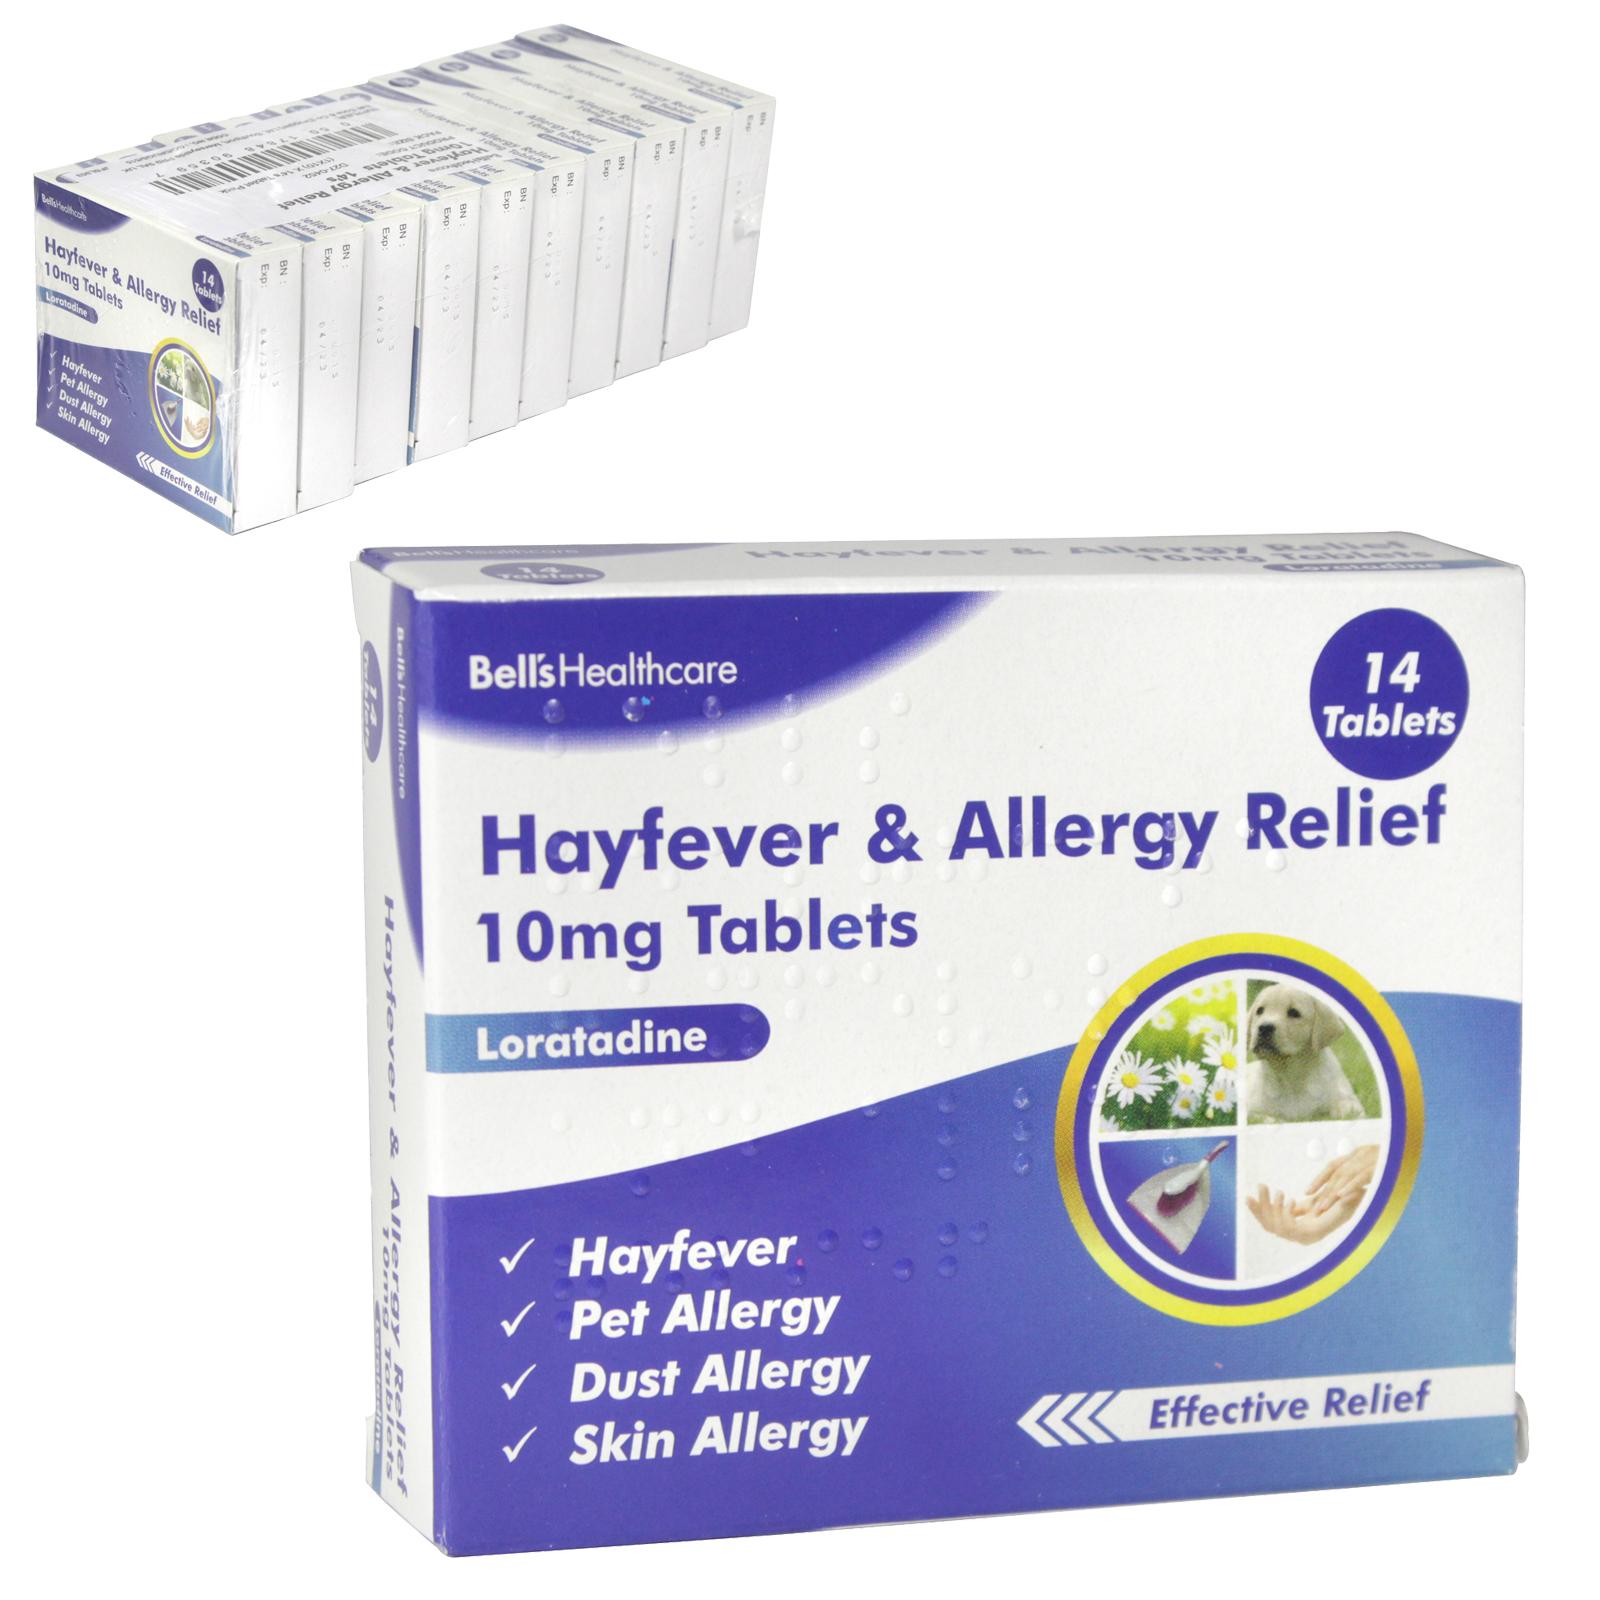 HAYFEVER+ALLERGY OAD 14S LORITADINE X10 (NON RETURNABLE)